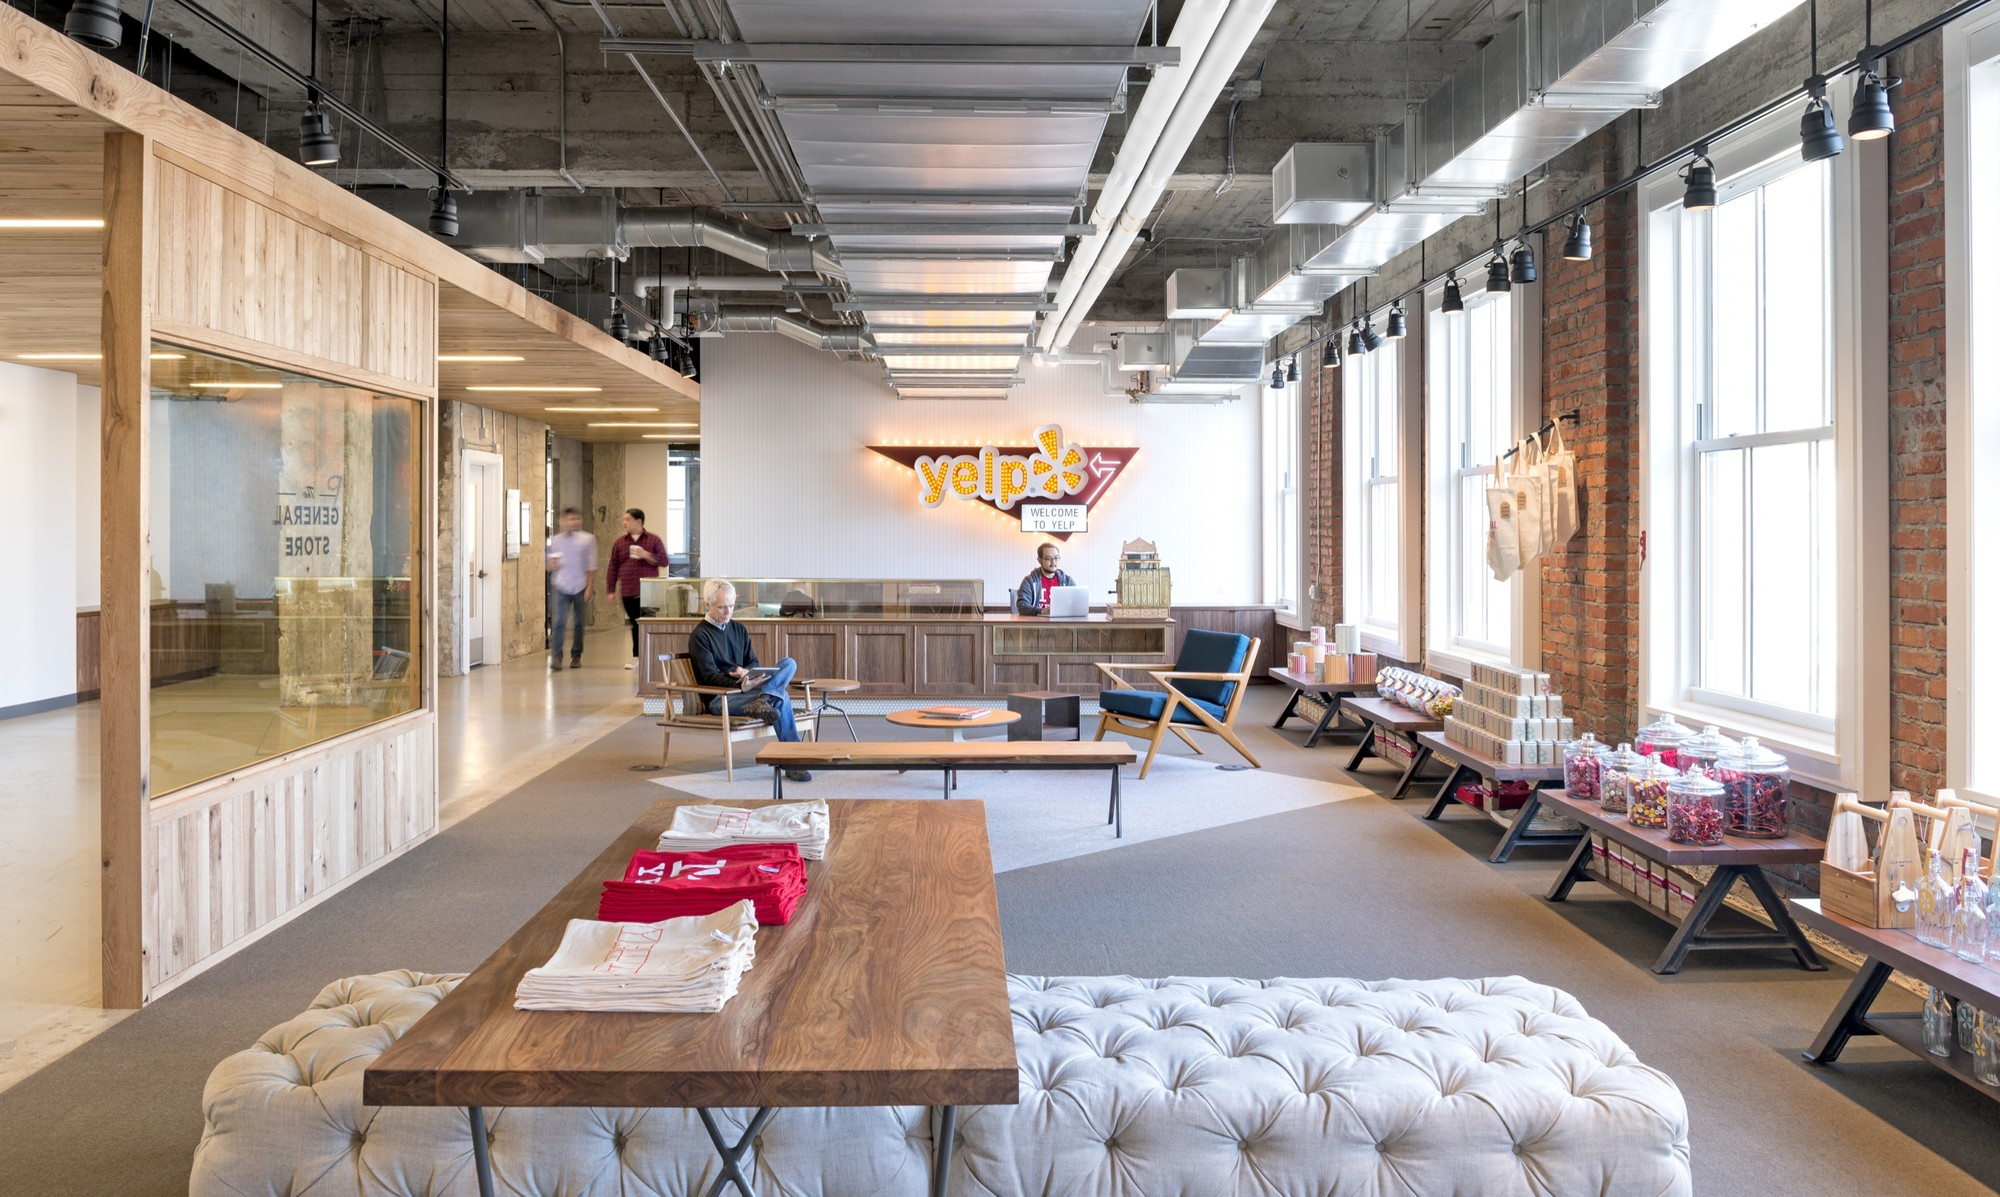 Gallery of Yelp Headquarters Studio OA 1